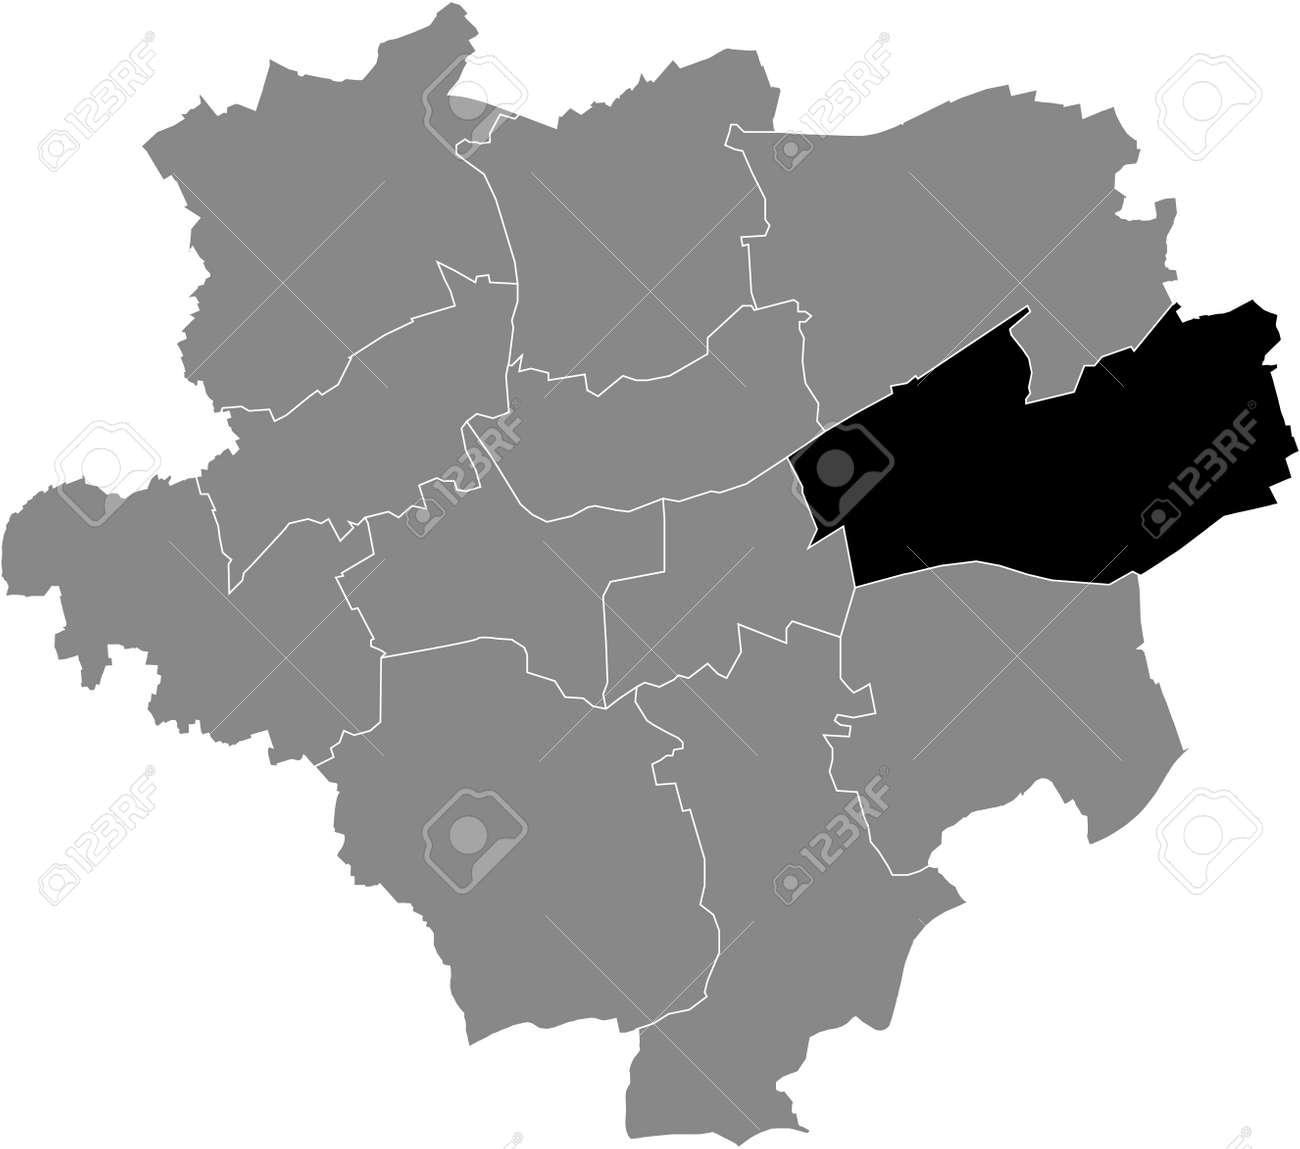 Black location map of the Dortmunder Stadtbezirk Brackel district inside the German regional capital city of Dortmund, Germany - 169986150